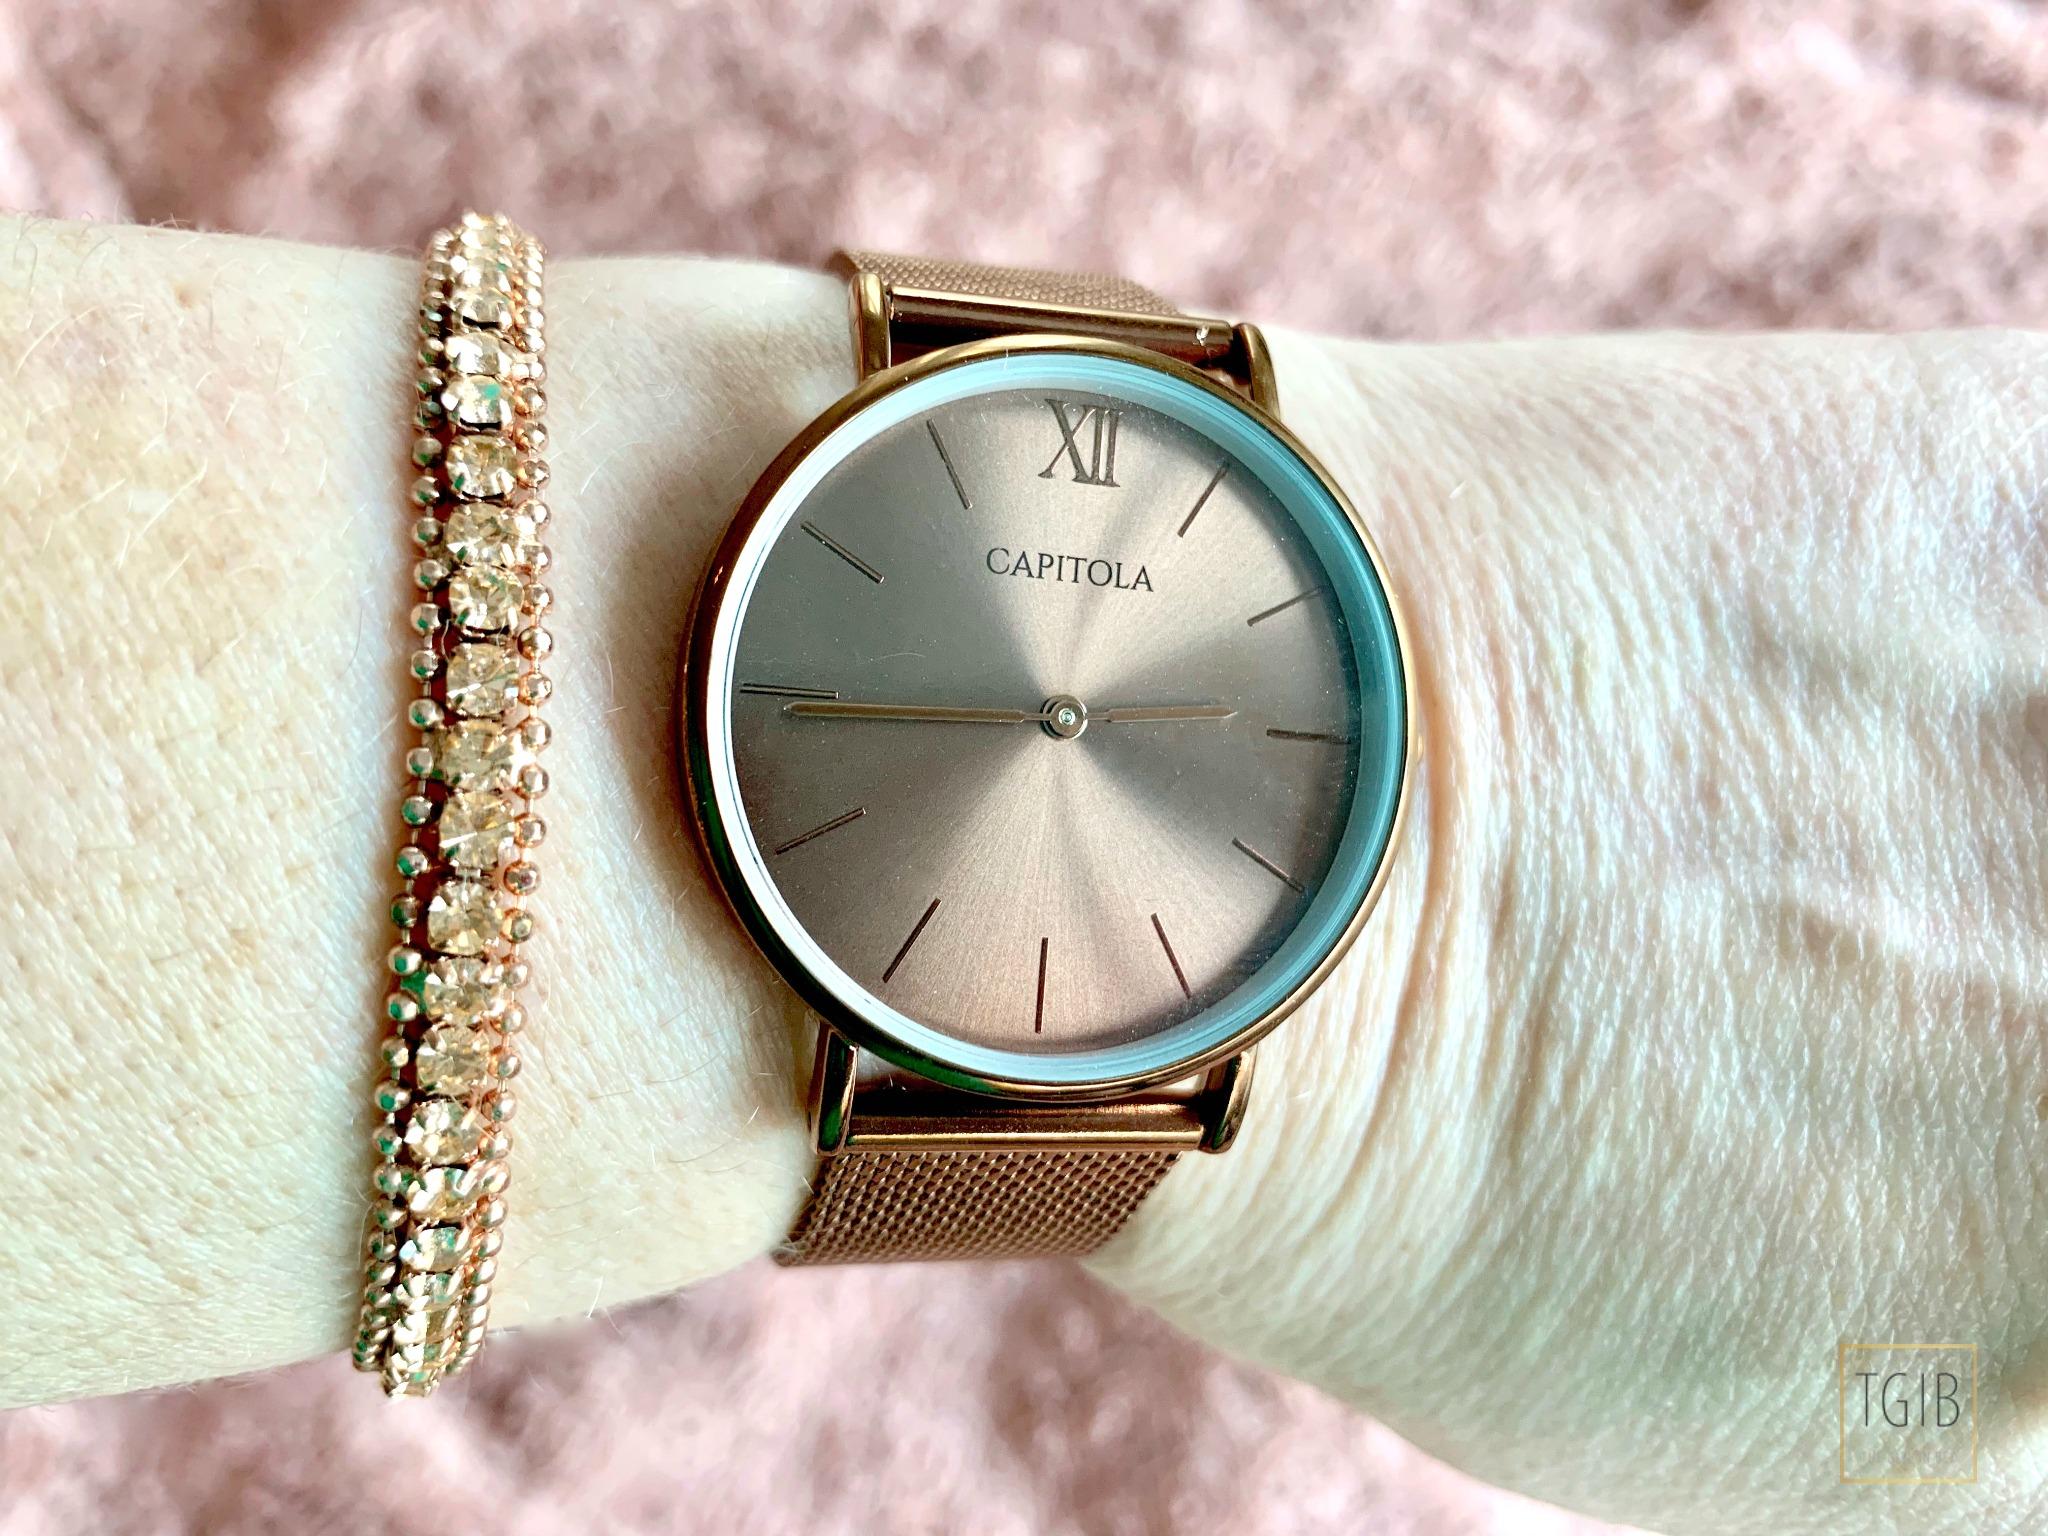 Capitola watch bracelet